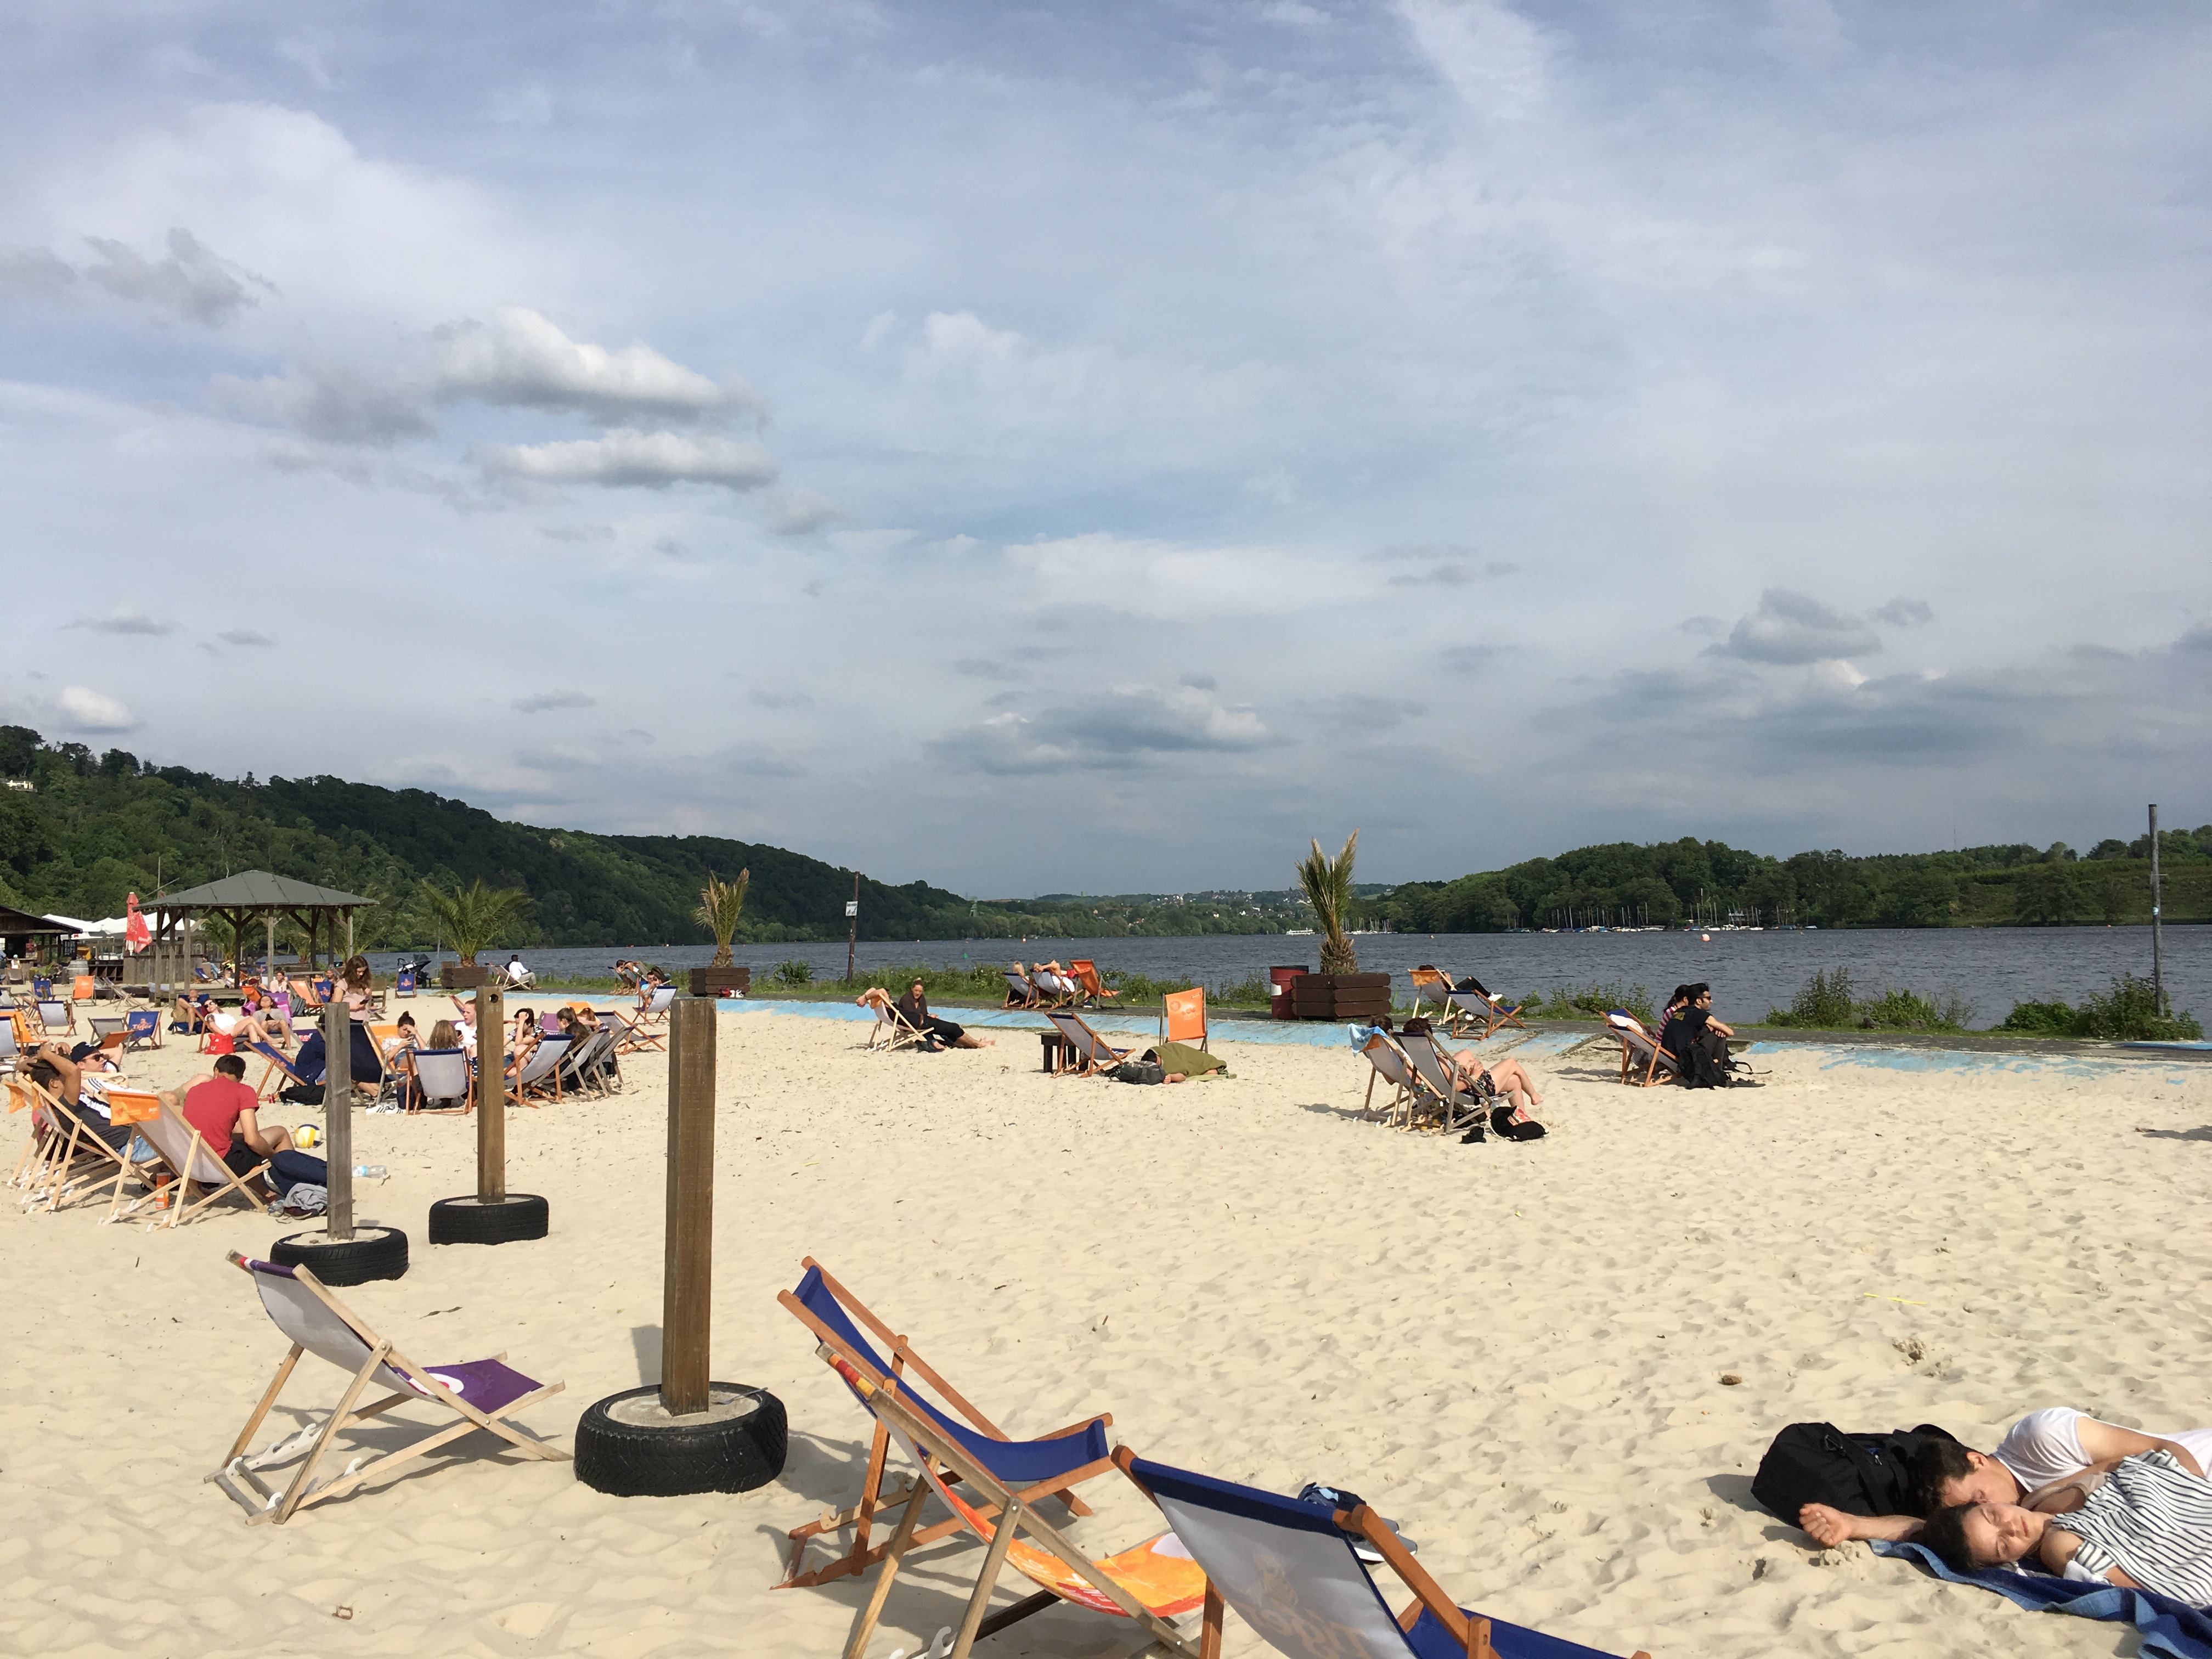 Seaside Beach Baldeney in Essen (alle Fotos: Jan Bender)